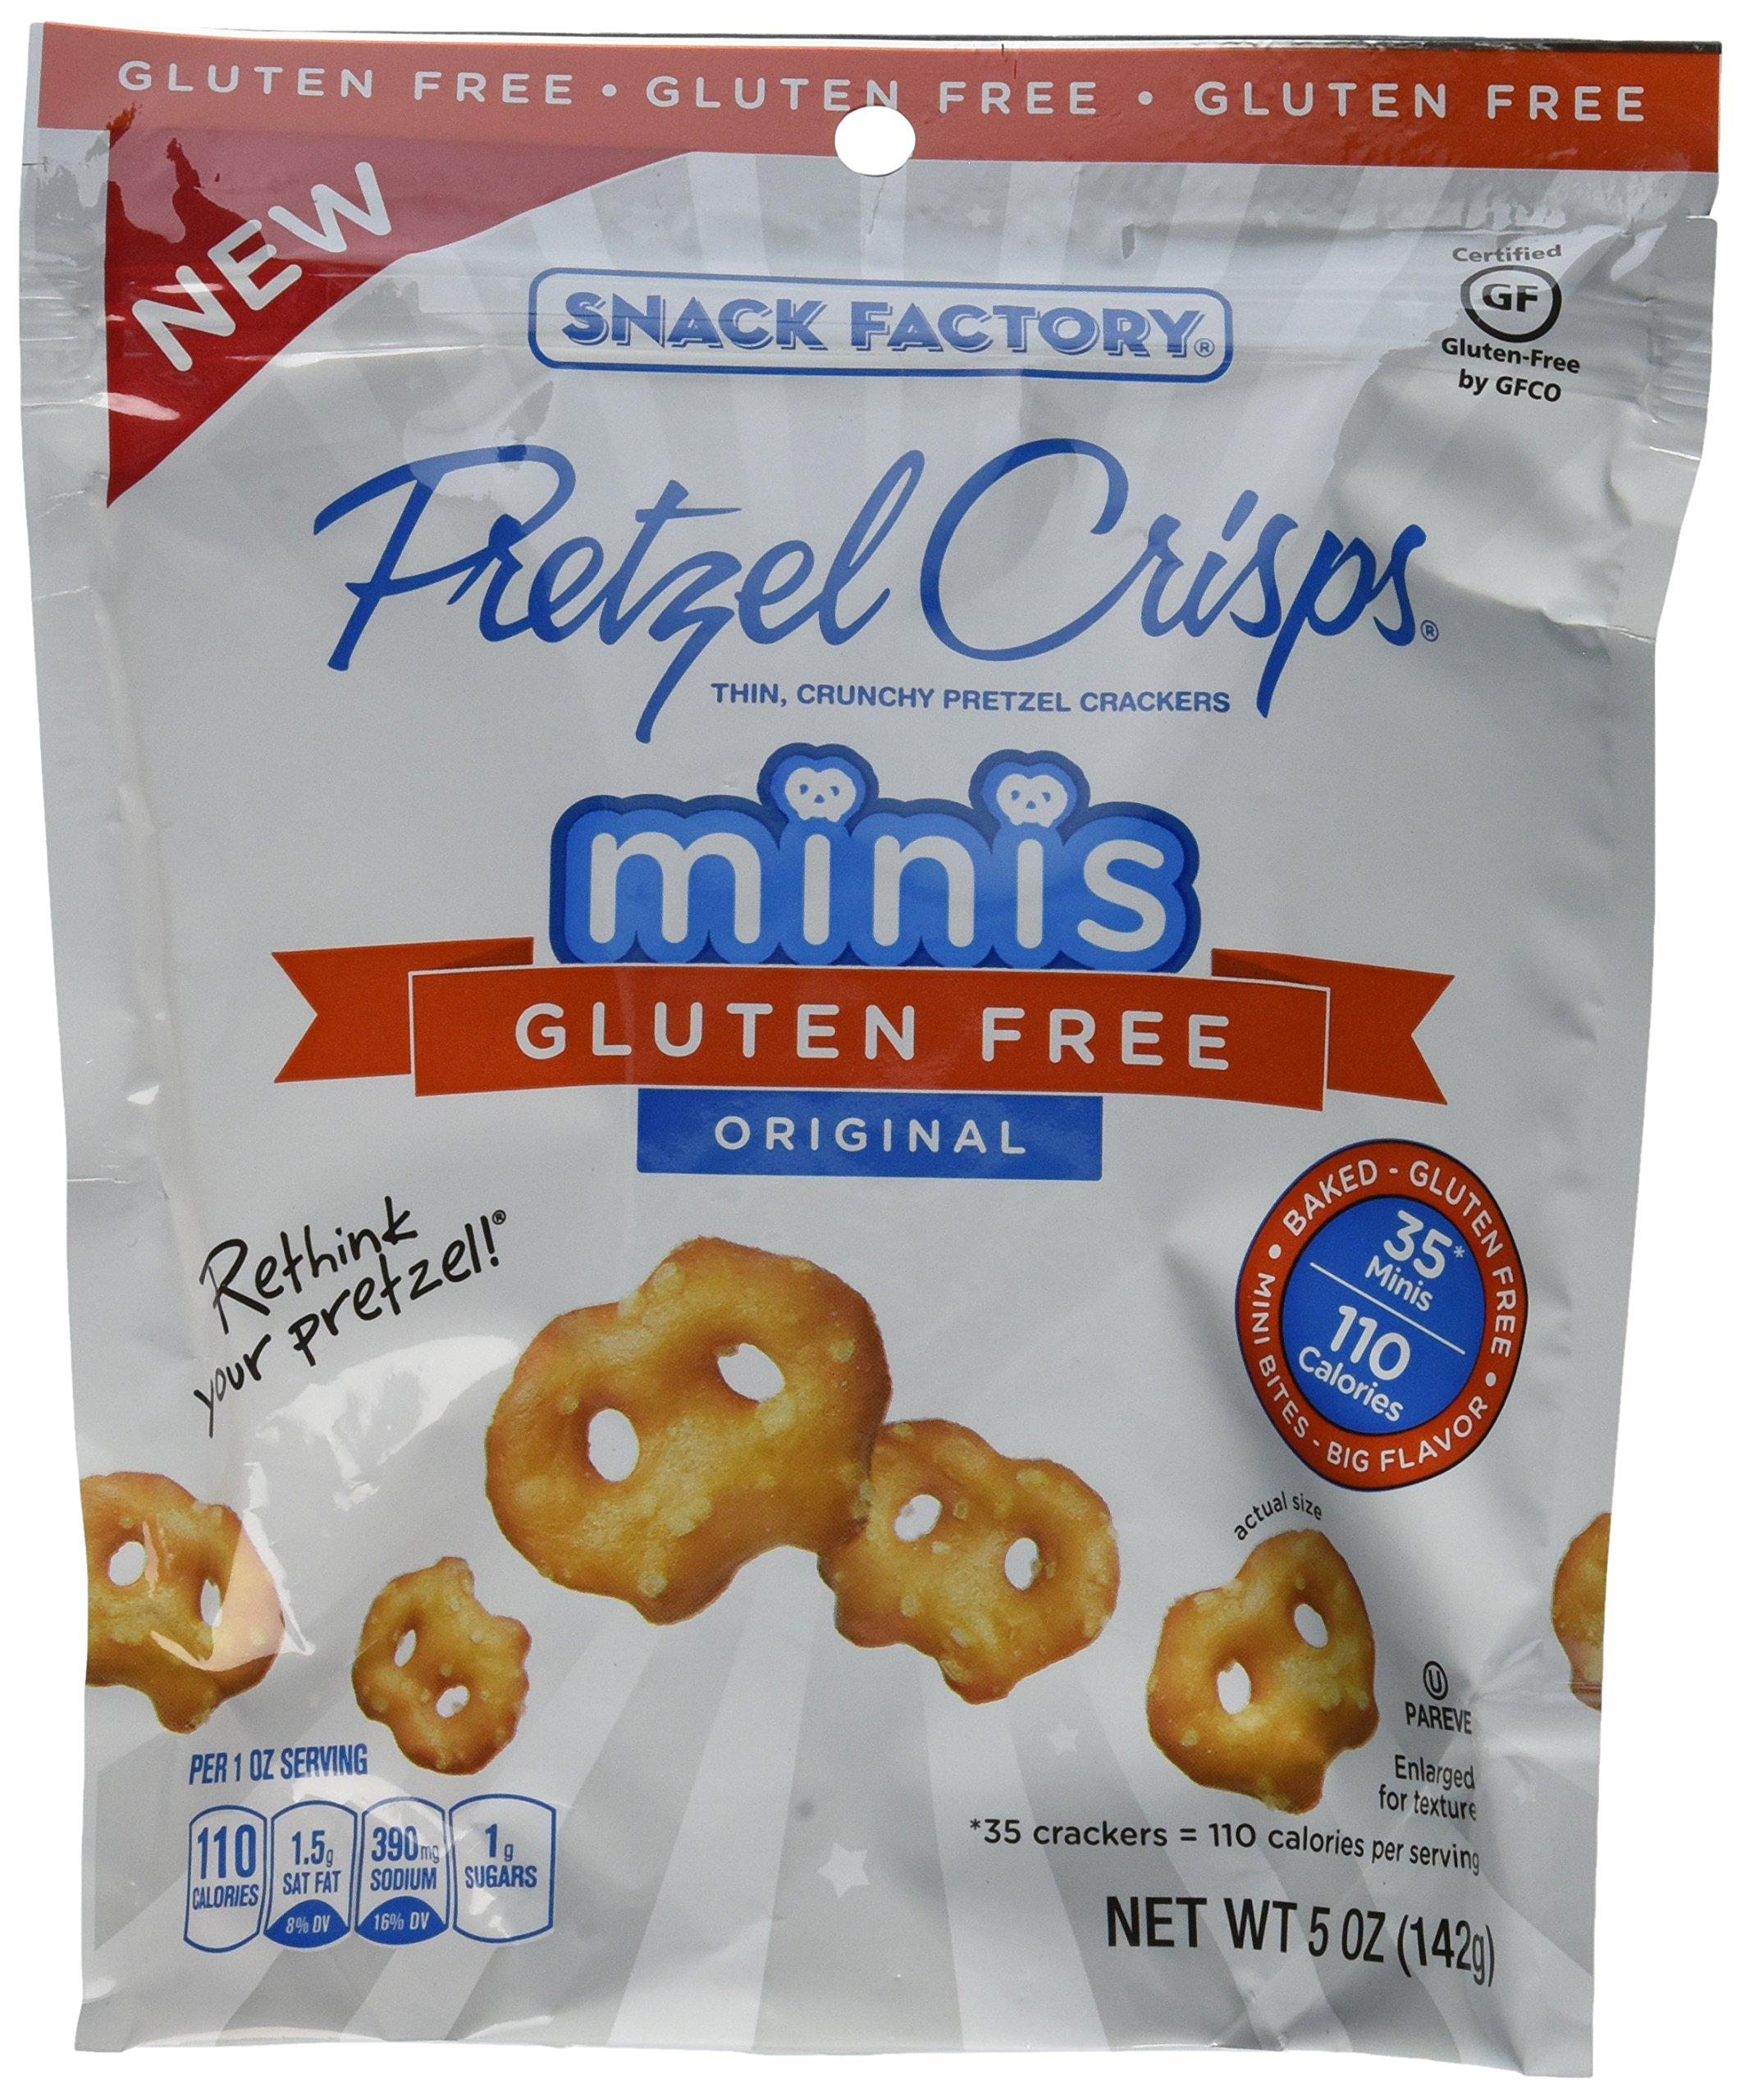 Pretzel Crisps Gluten Free Minis Case of 12 - 5 oz Bags (Original) by Snack Factory